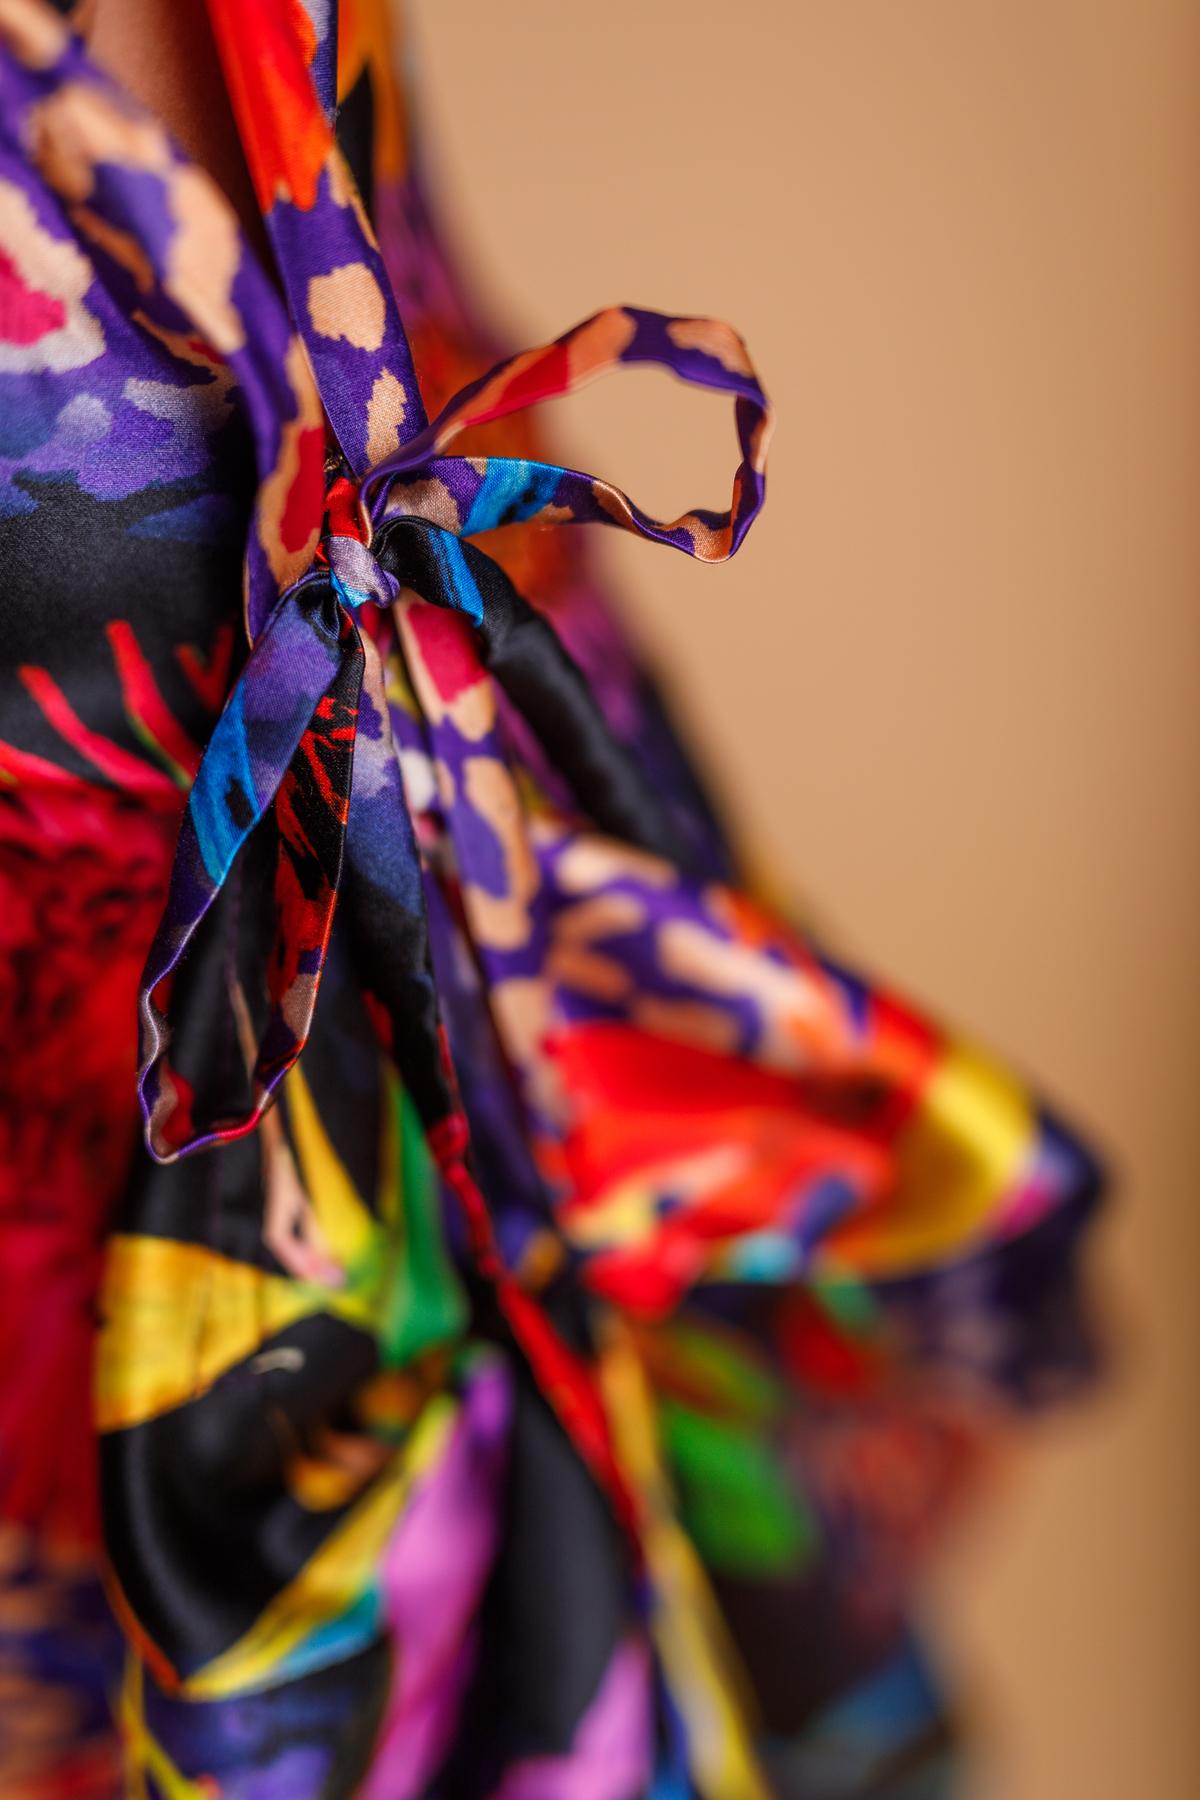 Detail bias draped dress by Saskia ter Welle